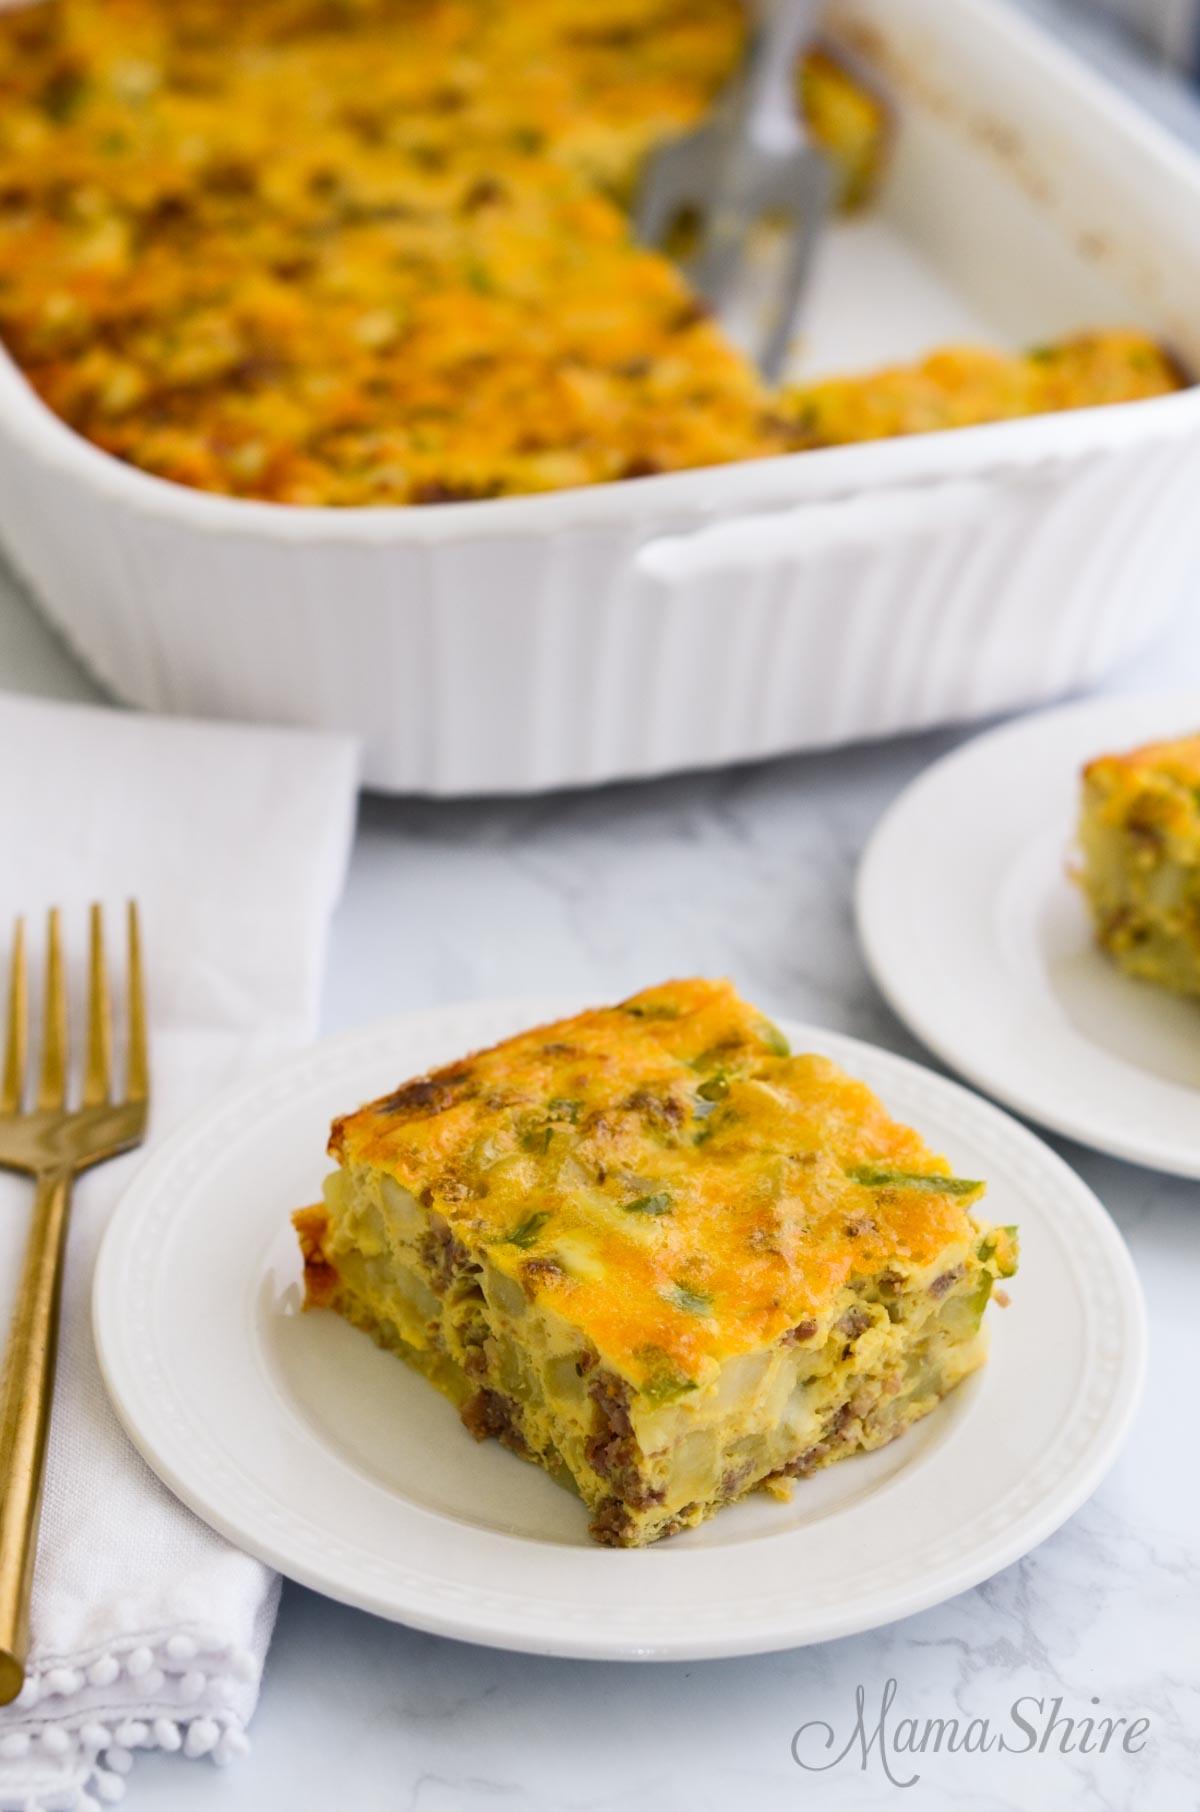 Overnight breakfast casserole made from a gluten-free recipe.